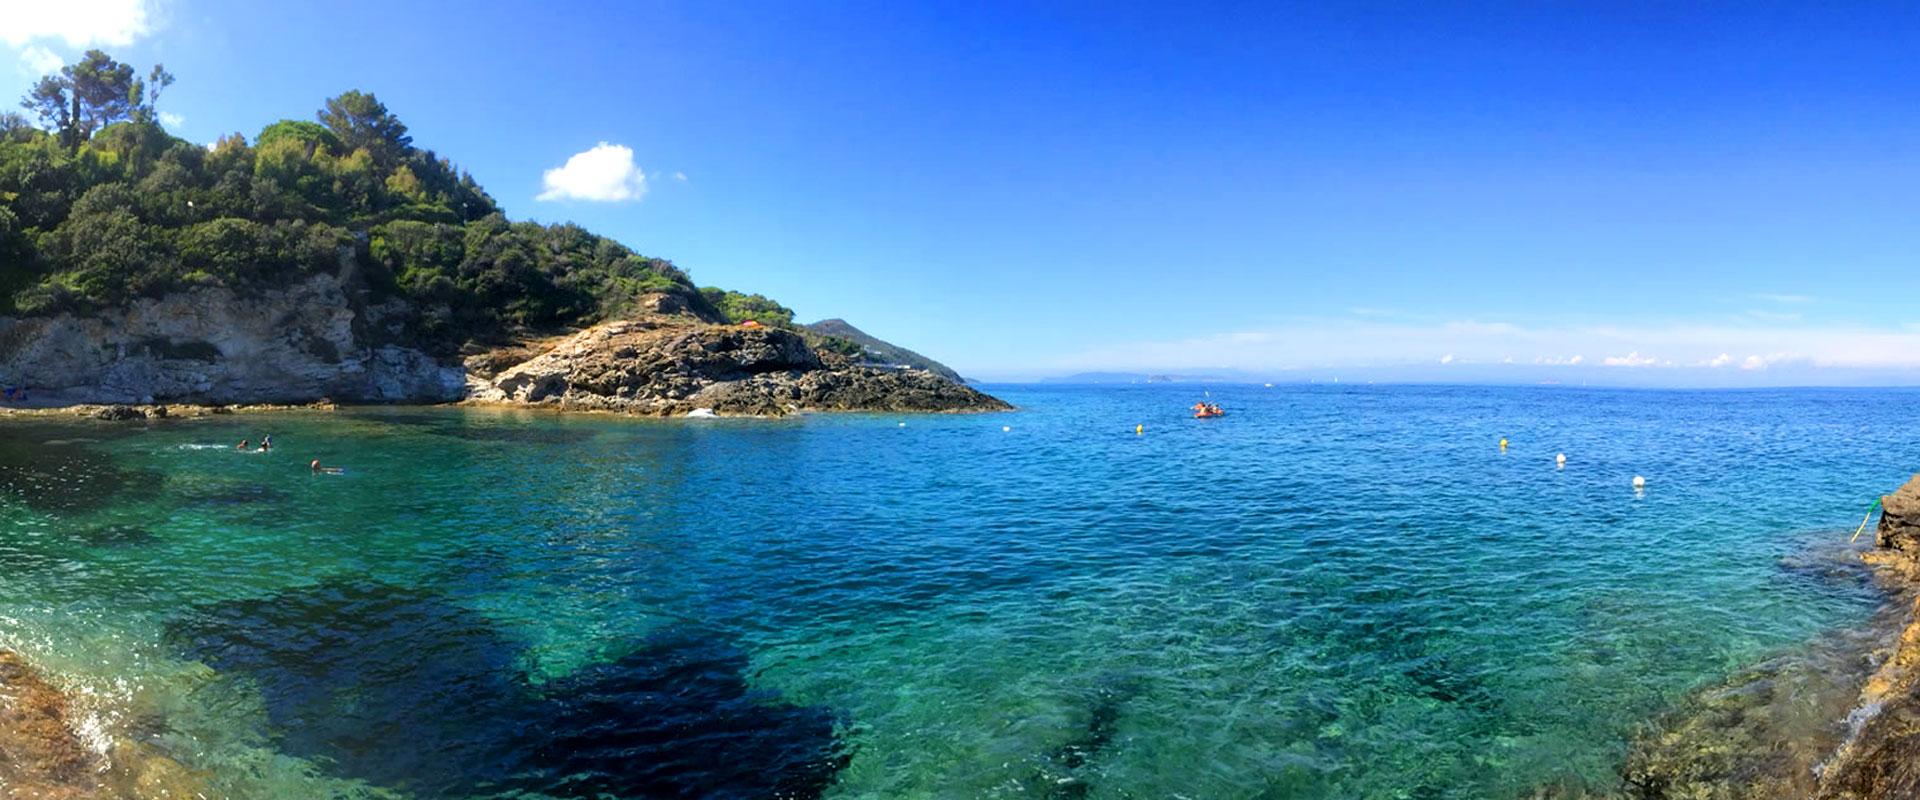 Le Discenderie - Isola D'Elba